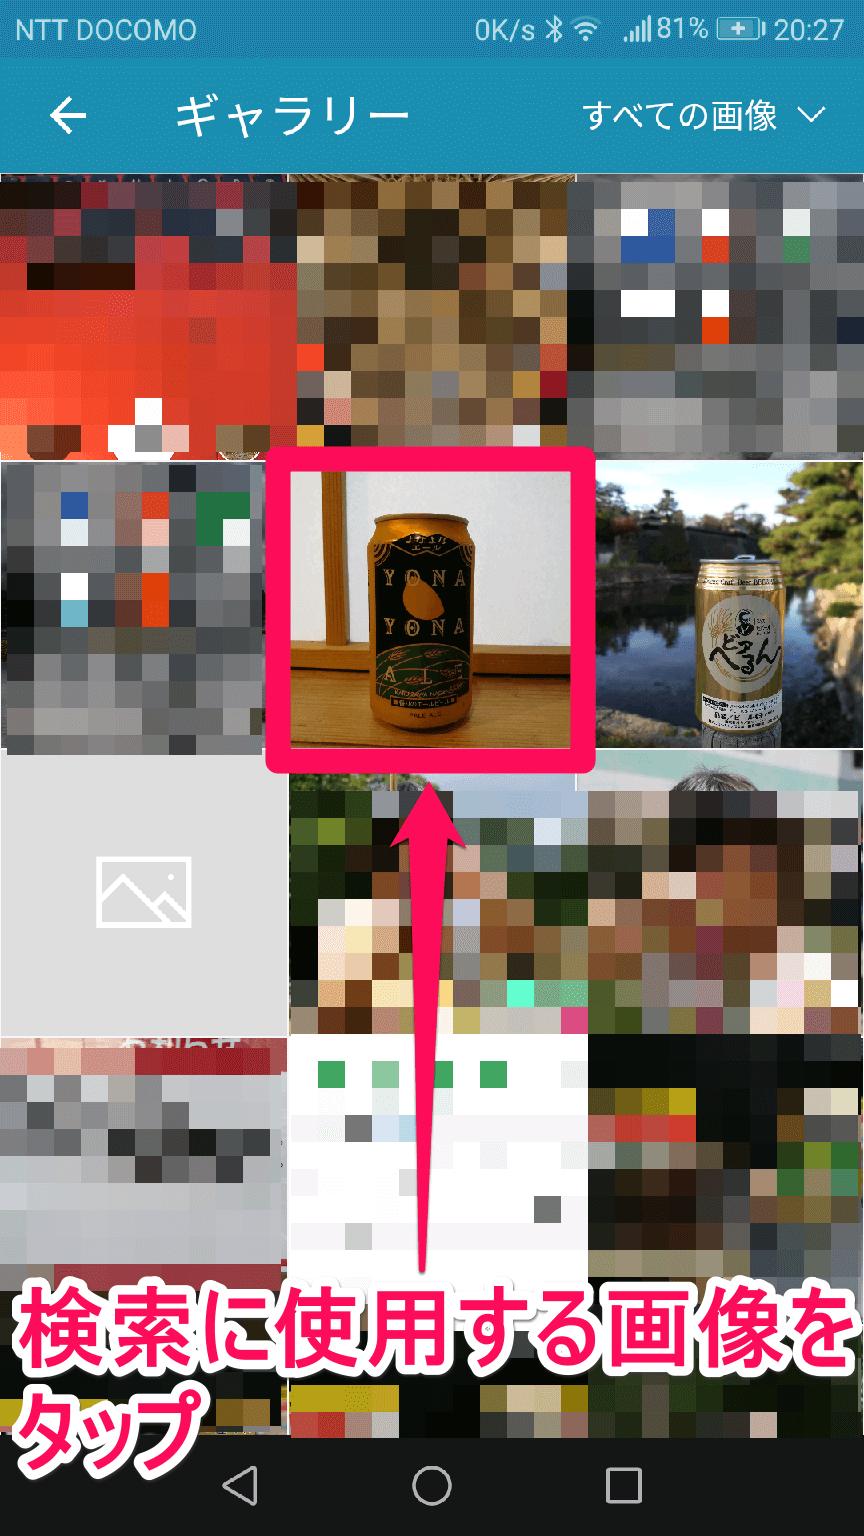 Android版(アンドロイド版)の「Bing」(ビング)アプリの画像検索で画像を選択する画面